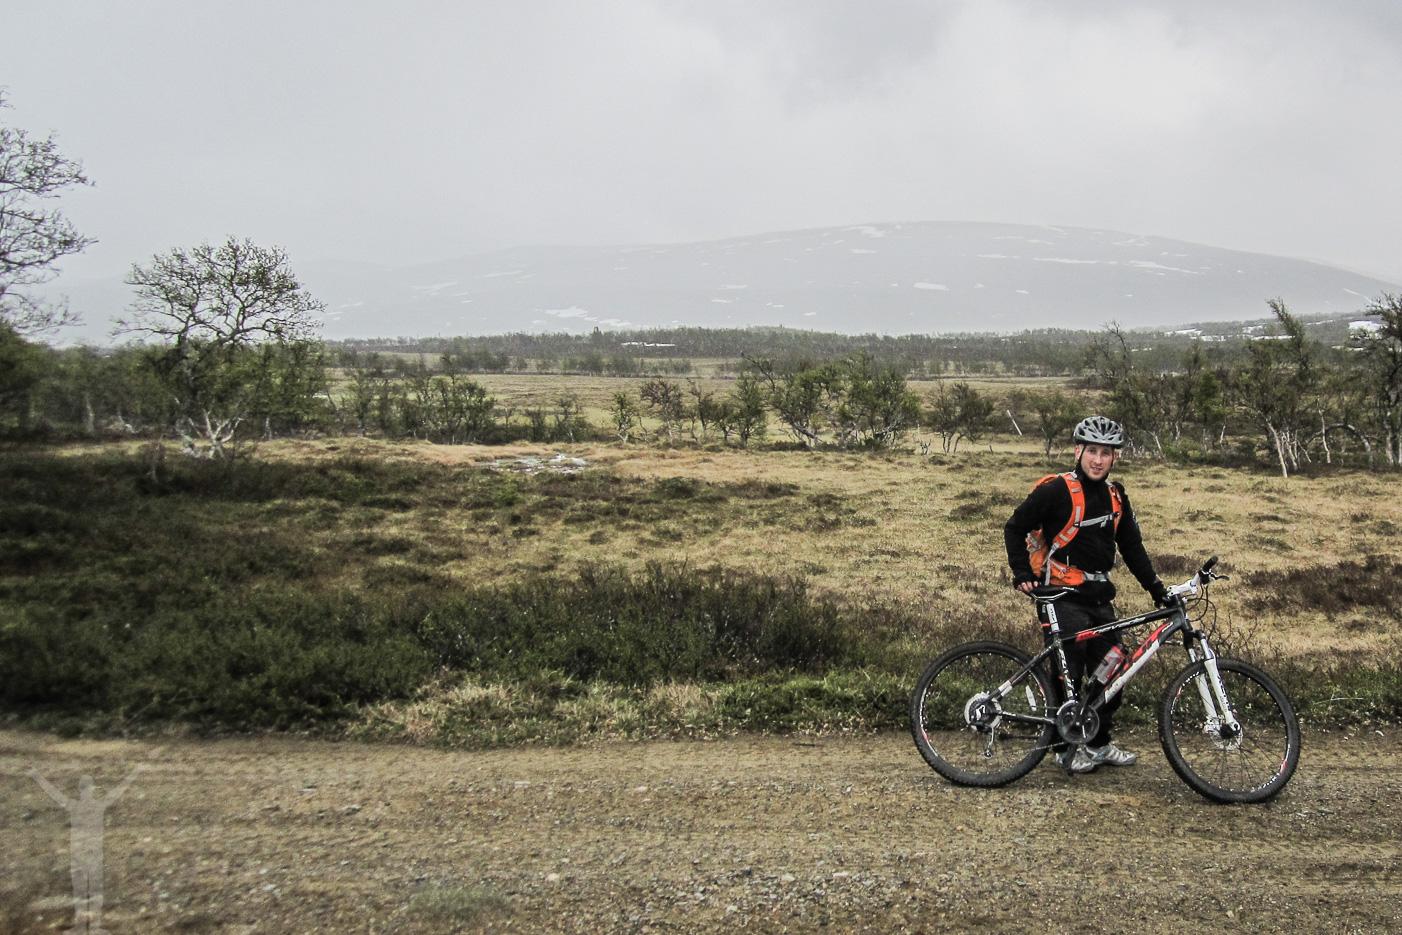 Dryden på mountainbike